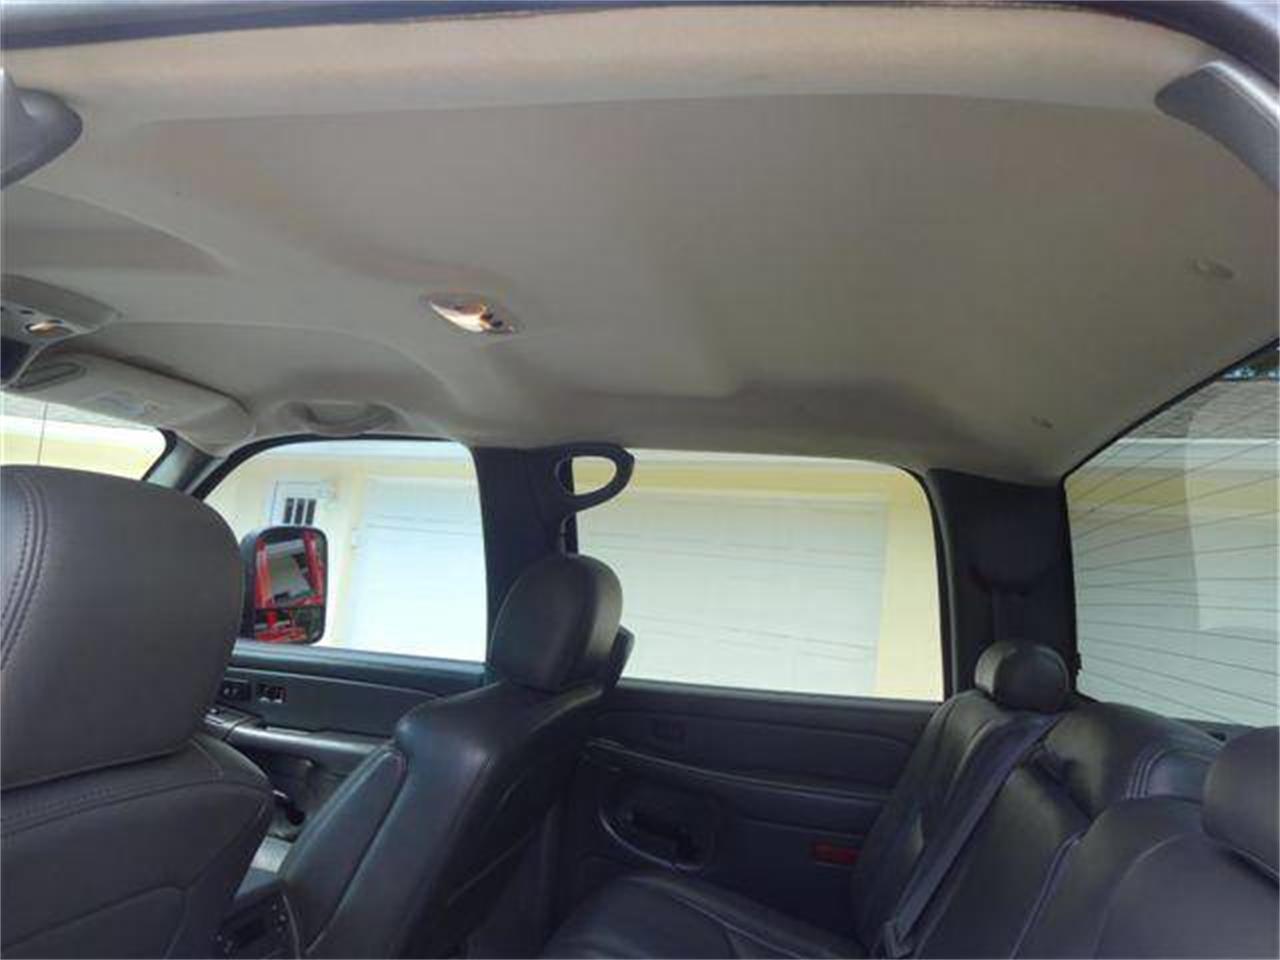 2006 Chevrolet Silverado (CC-1267430) for sale in Sarasota, Florida